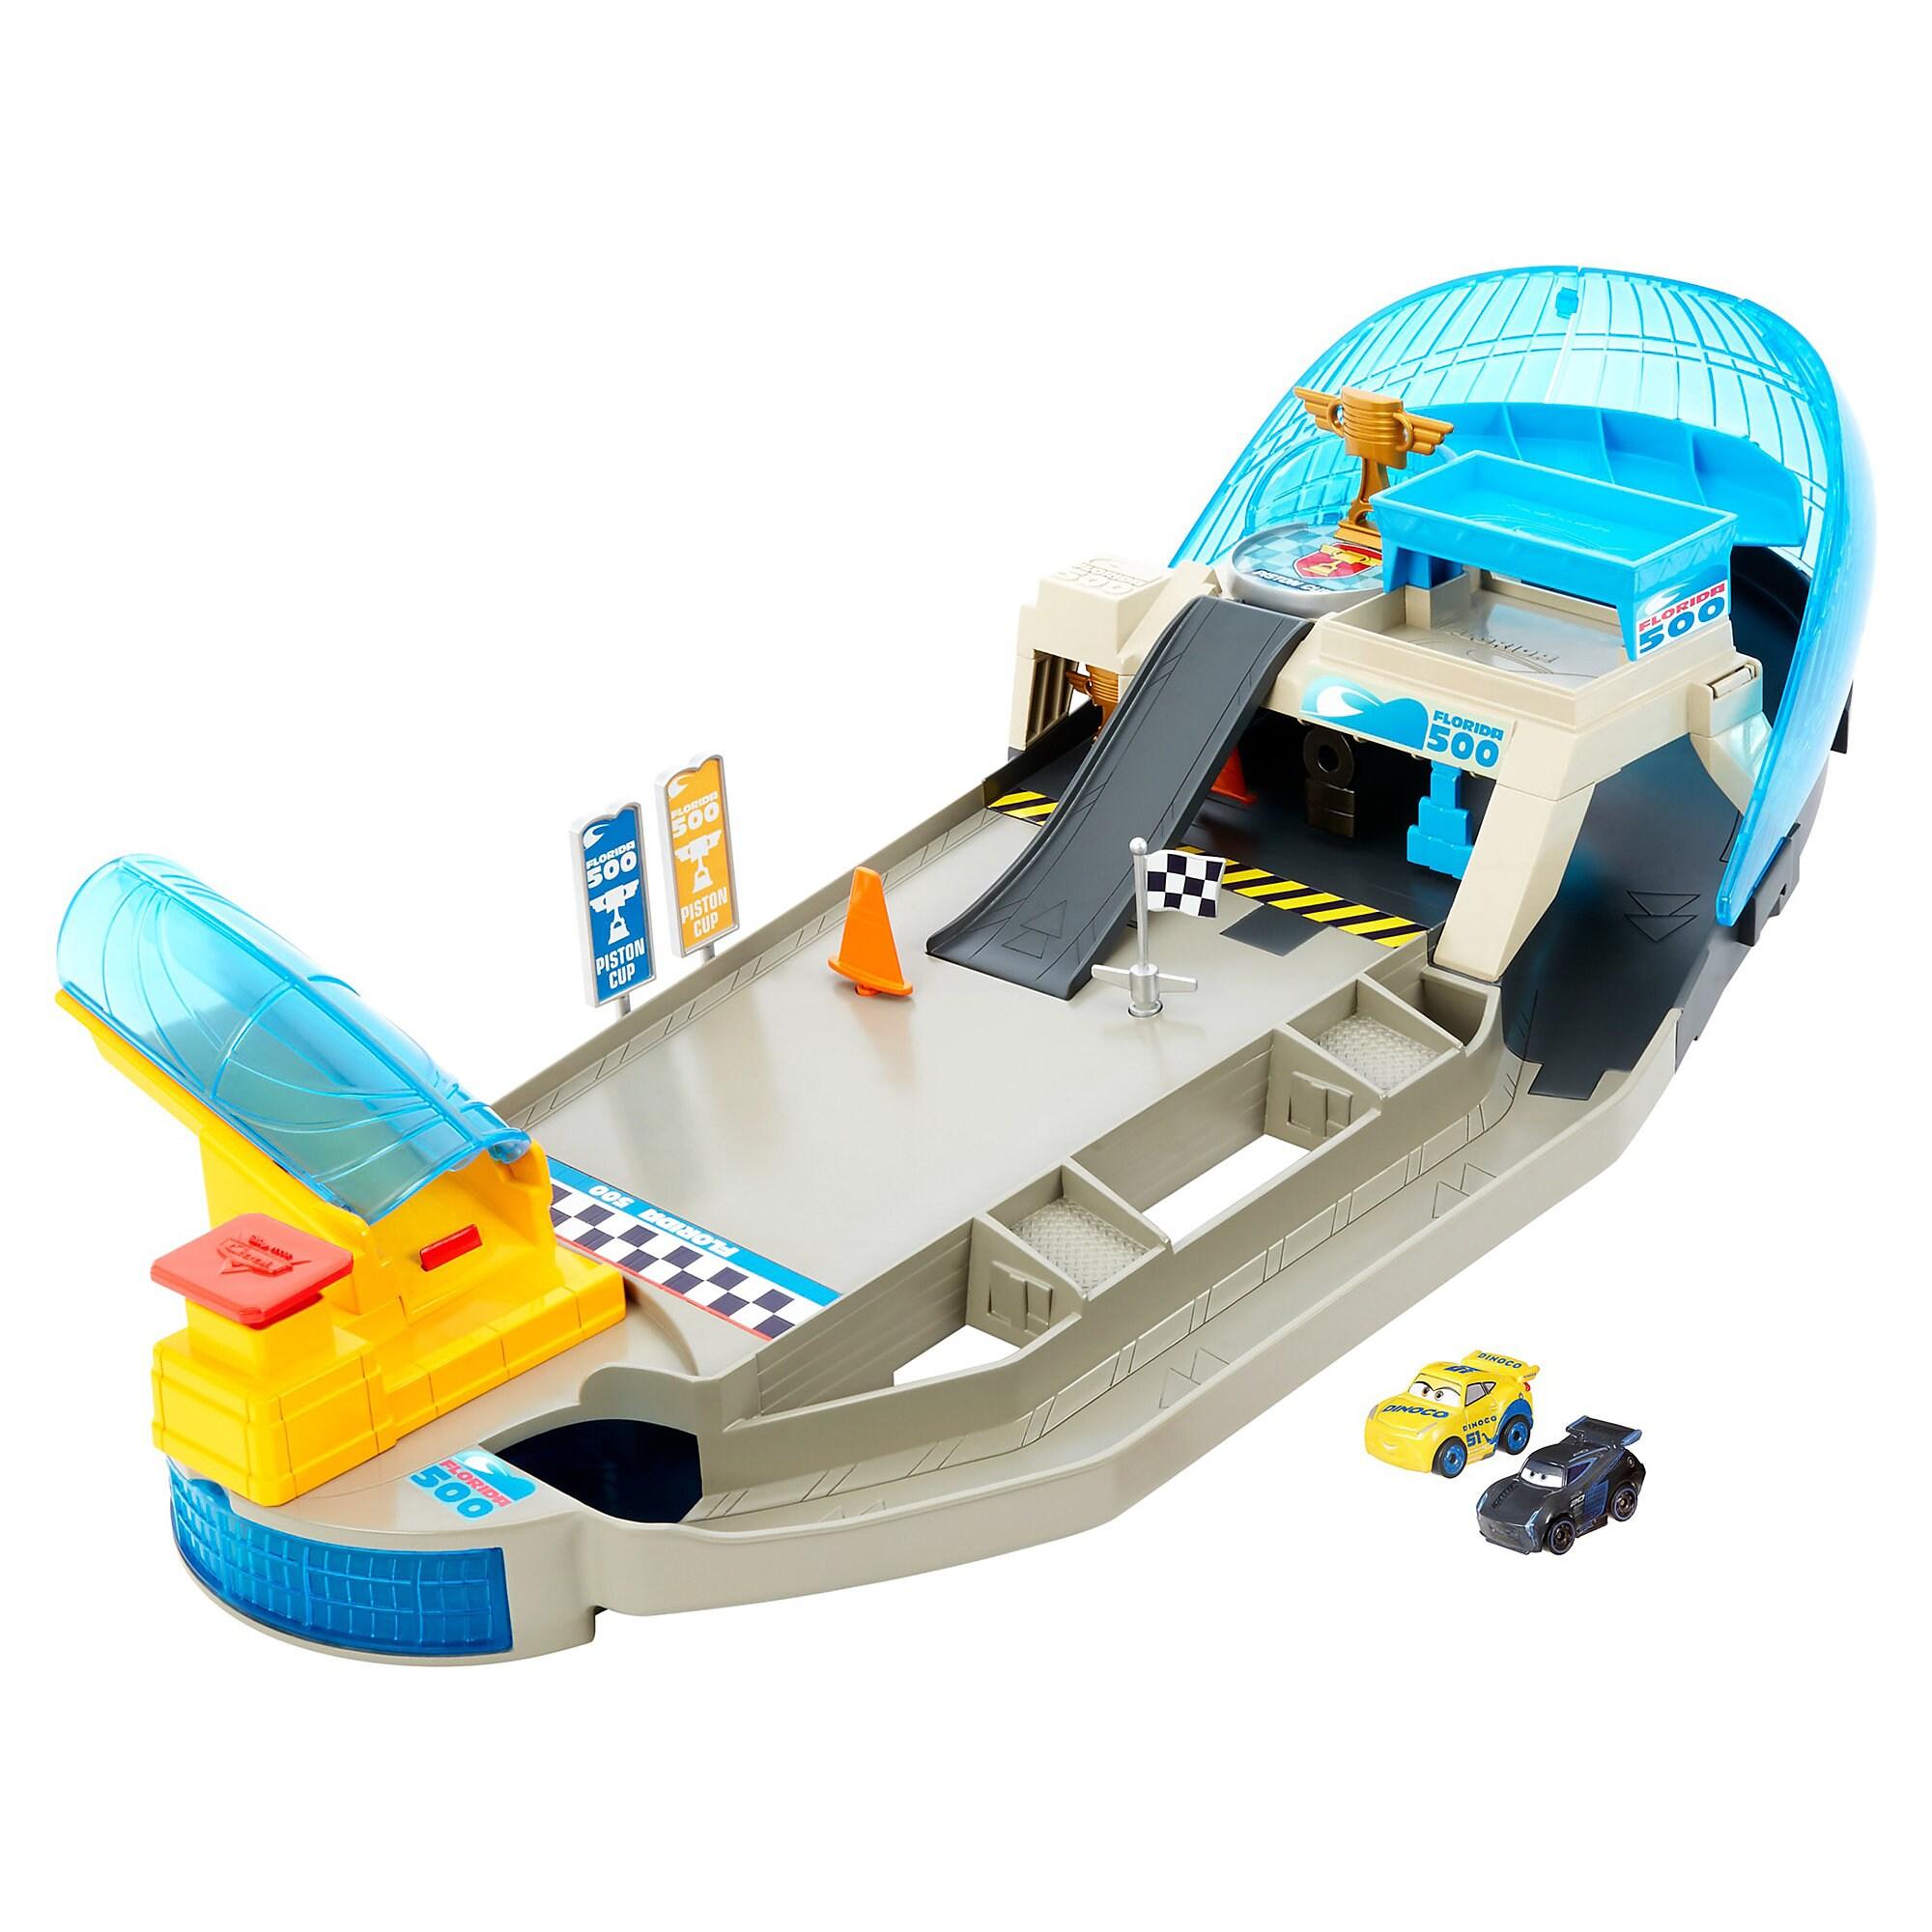 Cars Rollin' Raceway Playset by Mattel